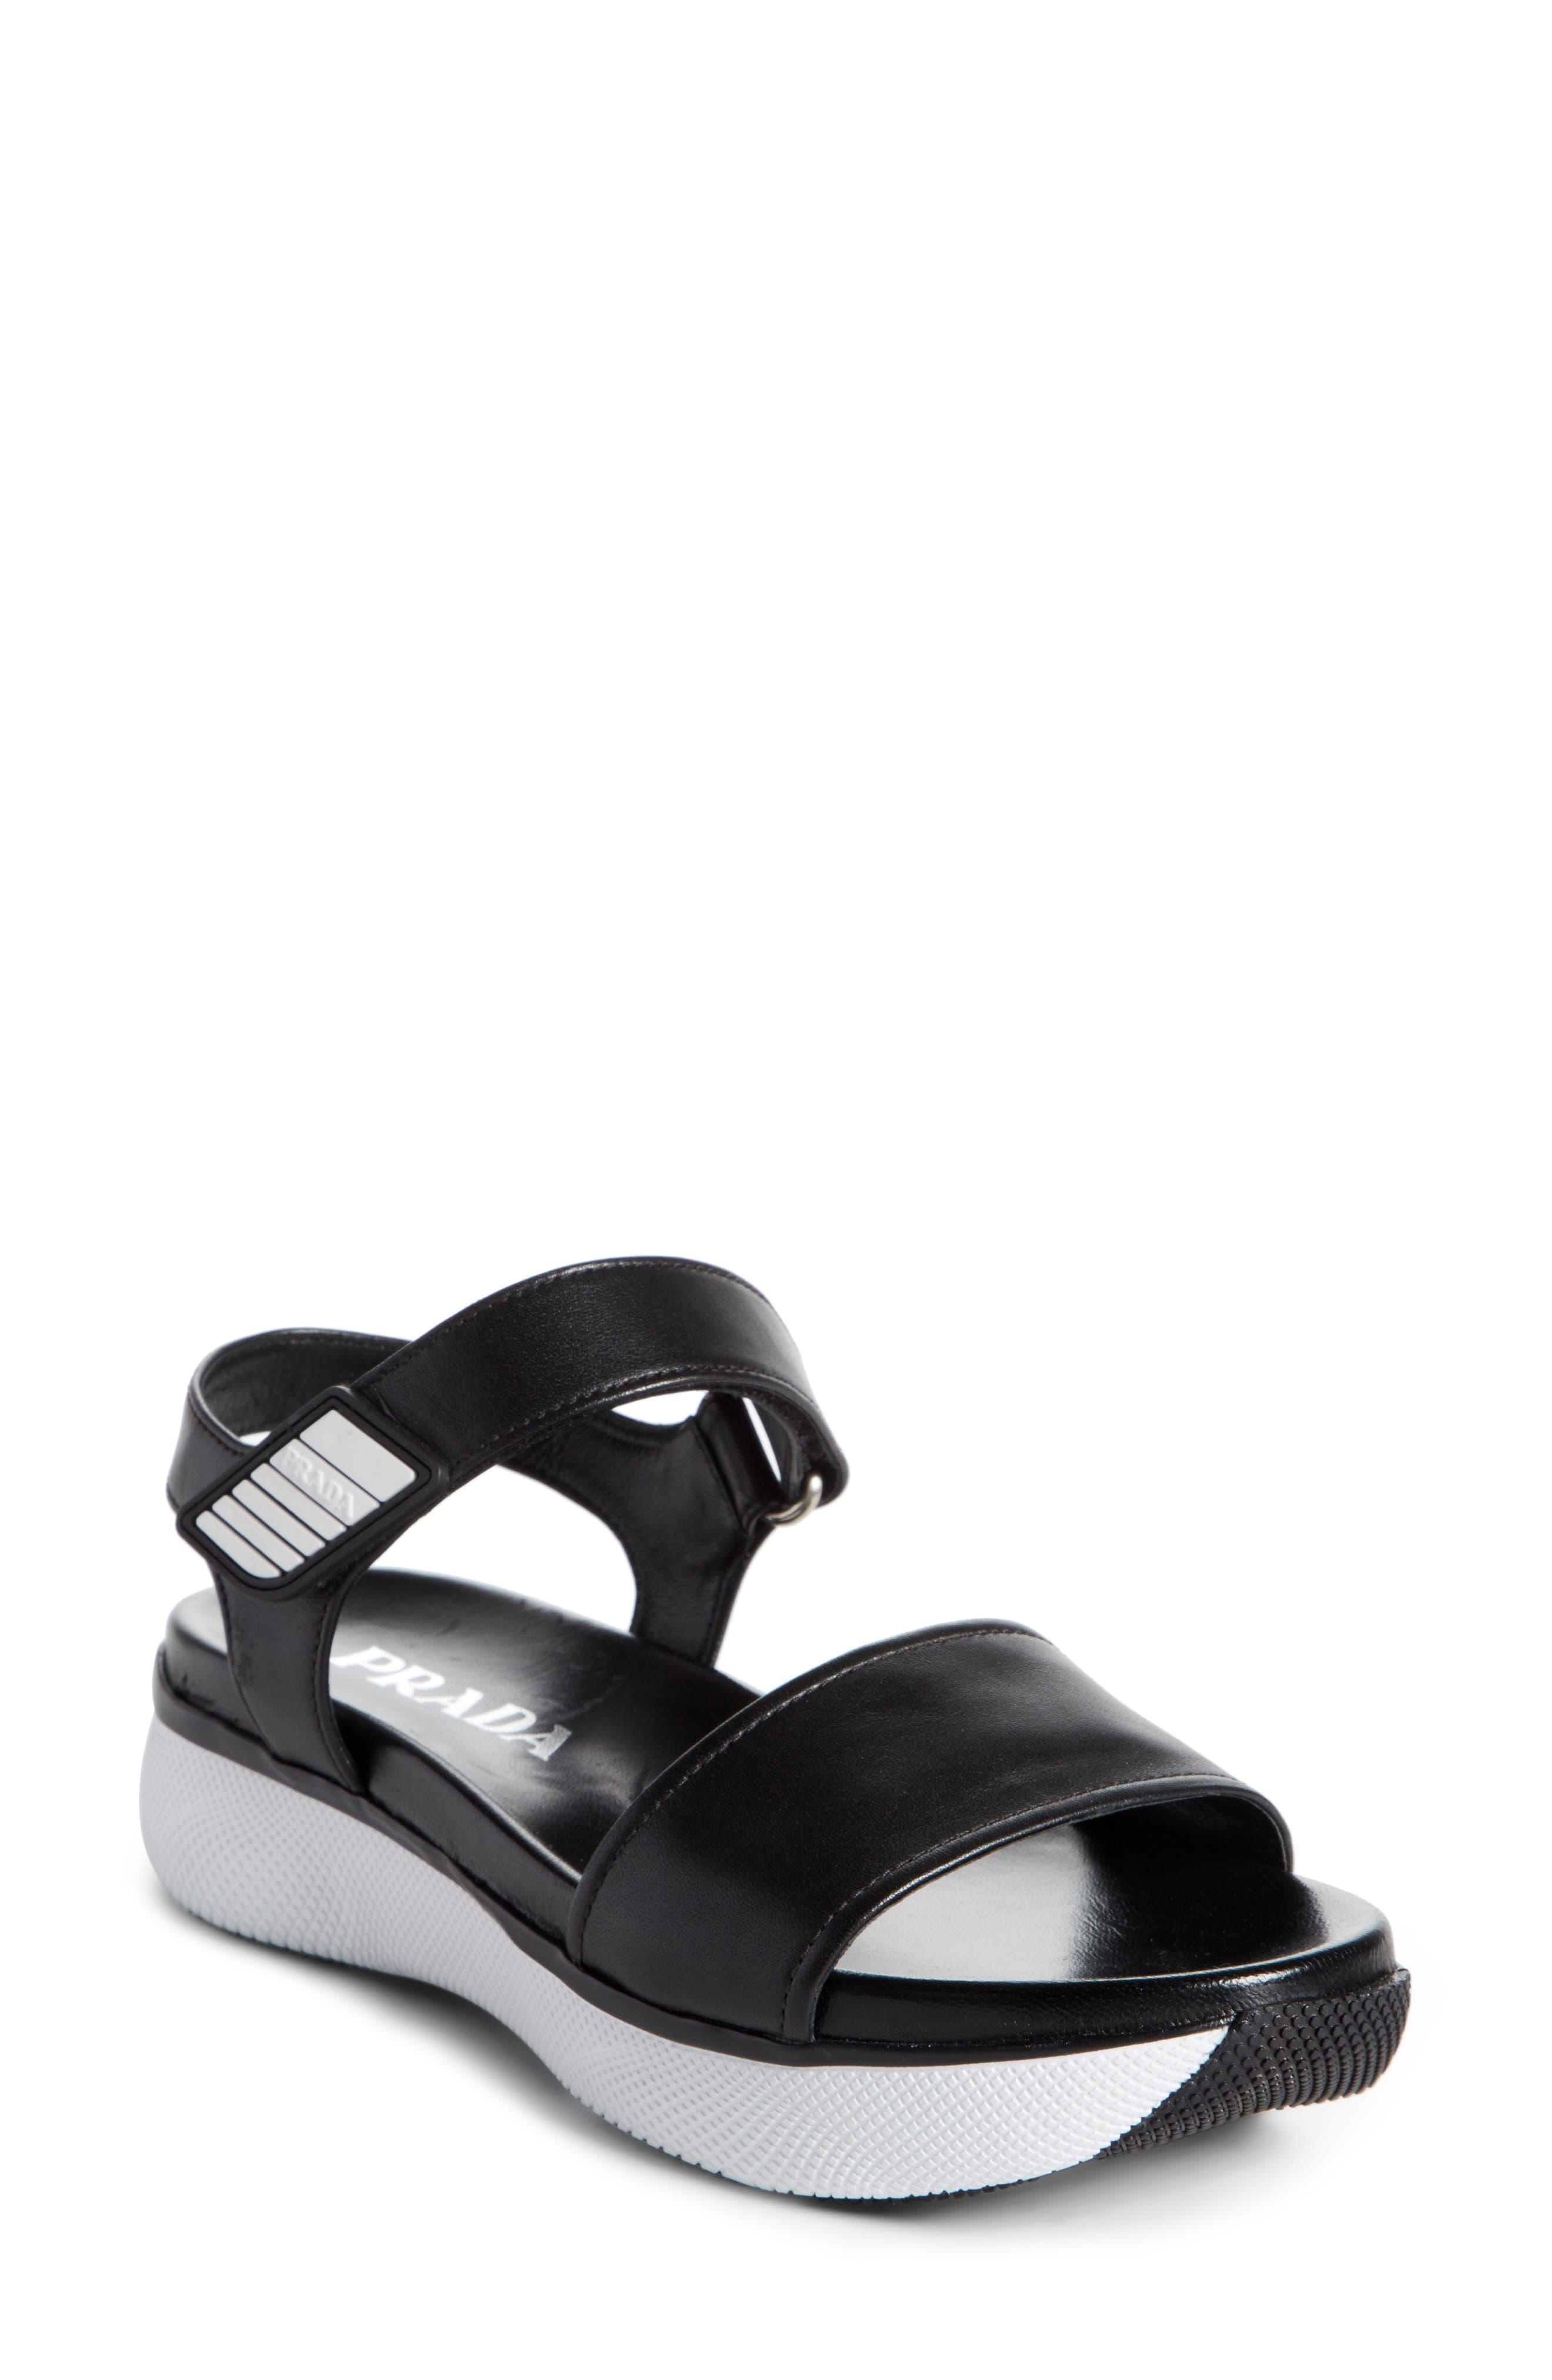 Platform Sandal,                         Main,                         color, Black/ White